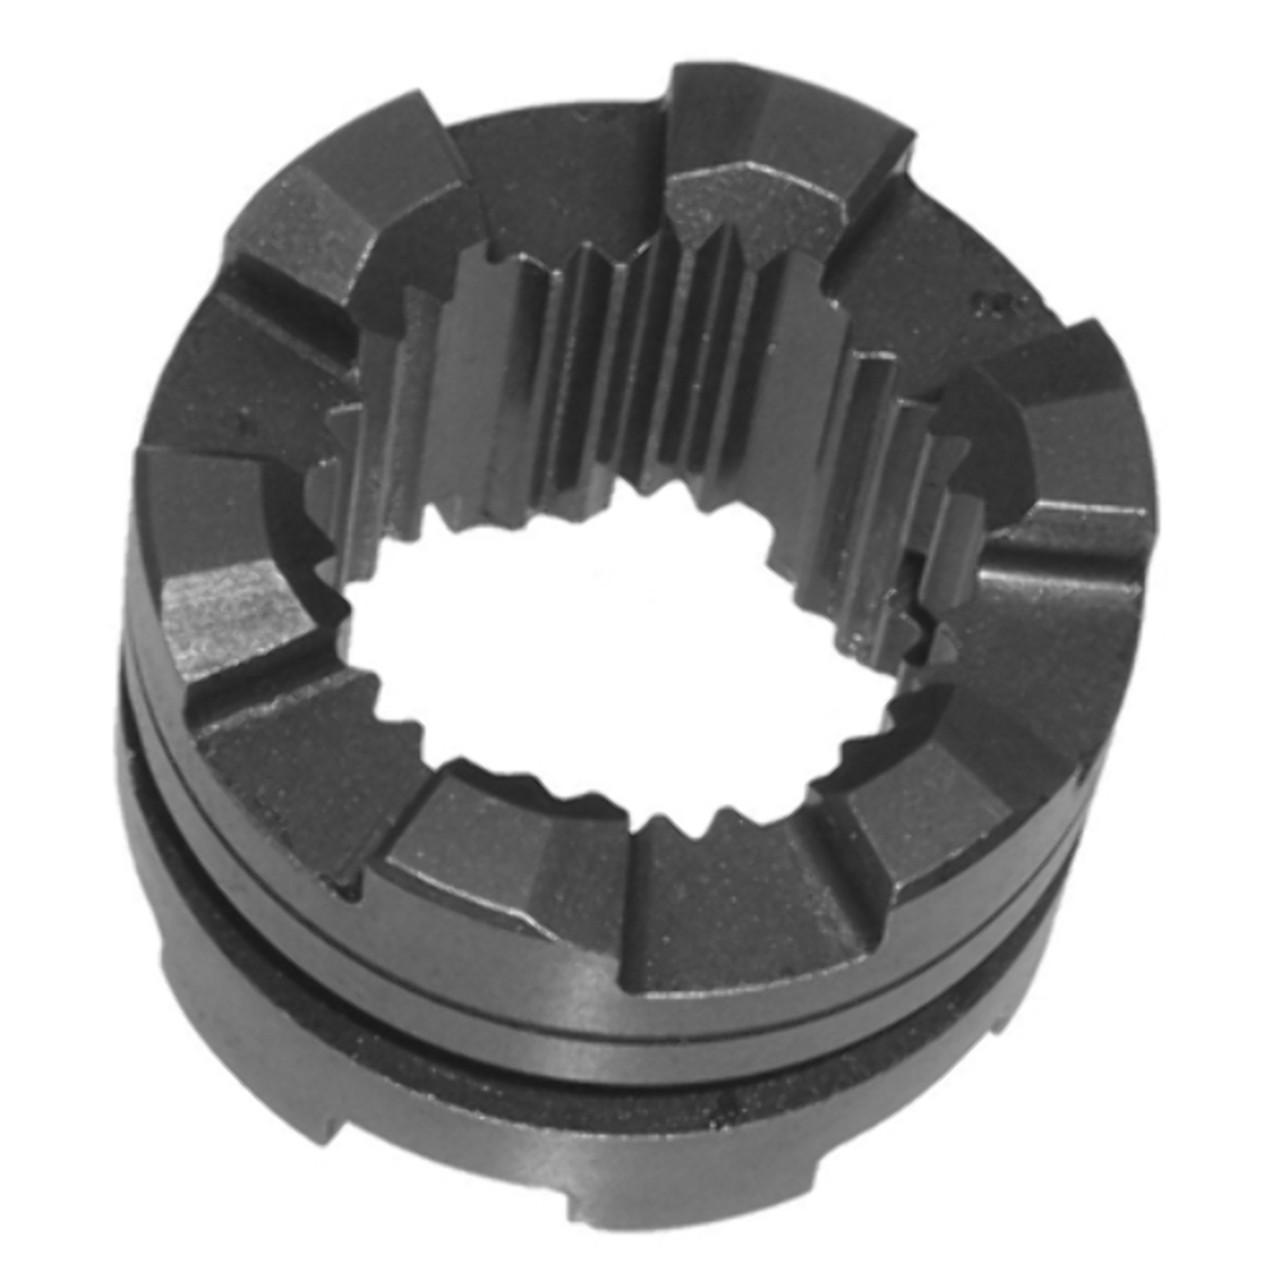 medium resolution of johnson evinrude stringer 4 cylinder v6 v8 1992 1993 clutch dog 915272 0914716 happiemac marine